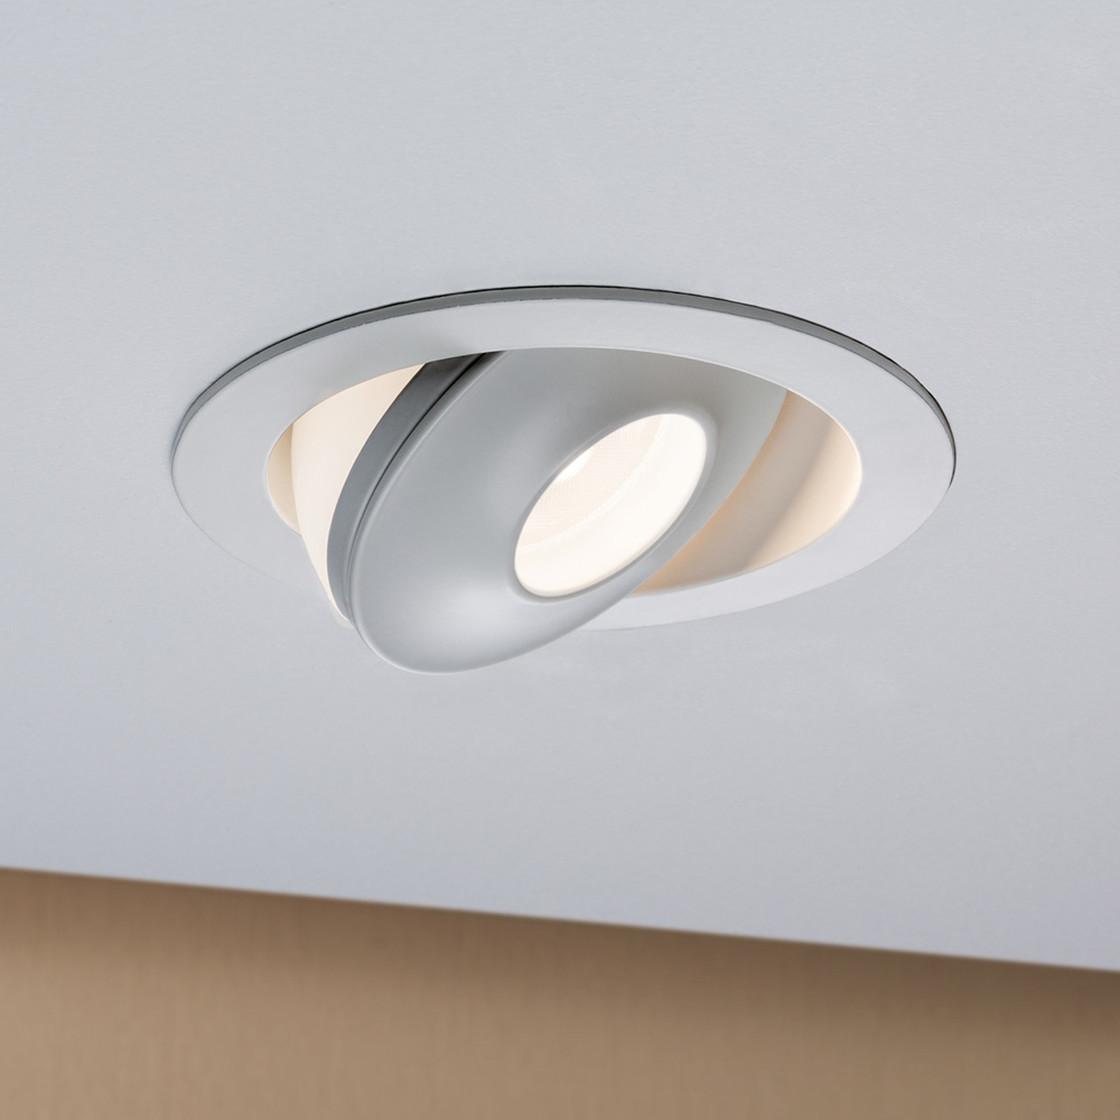 paulmann einbauleuchte led drip 8w weiss dimmbar und kippbar i 54 99. Black Bedroom Furniture Sets. Home Design Ideas